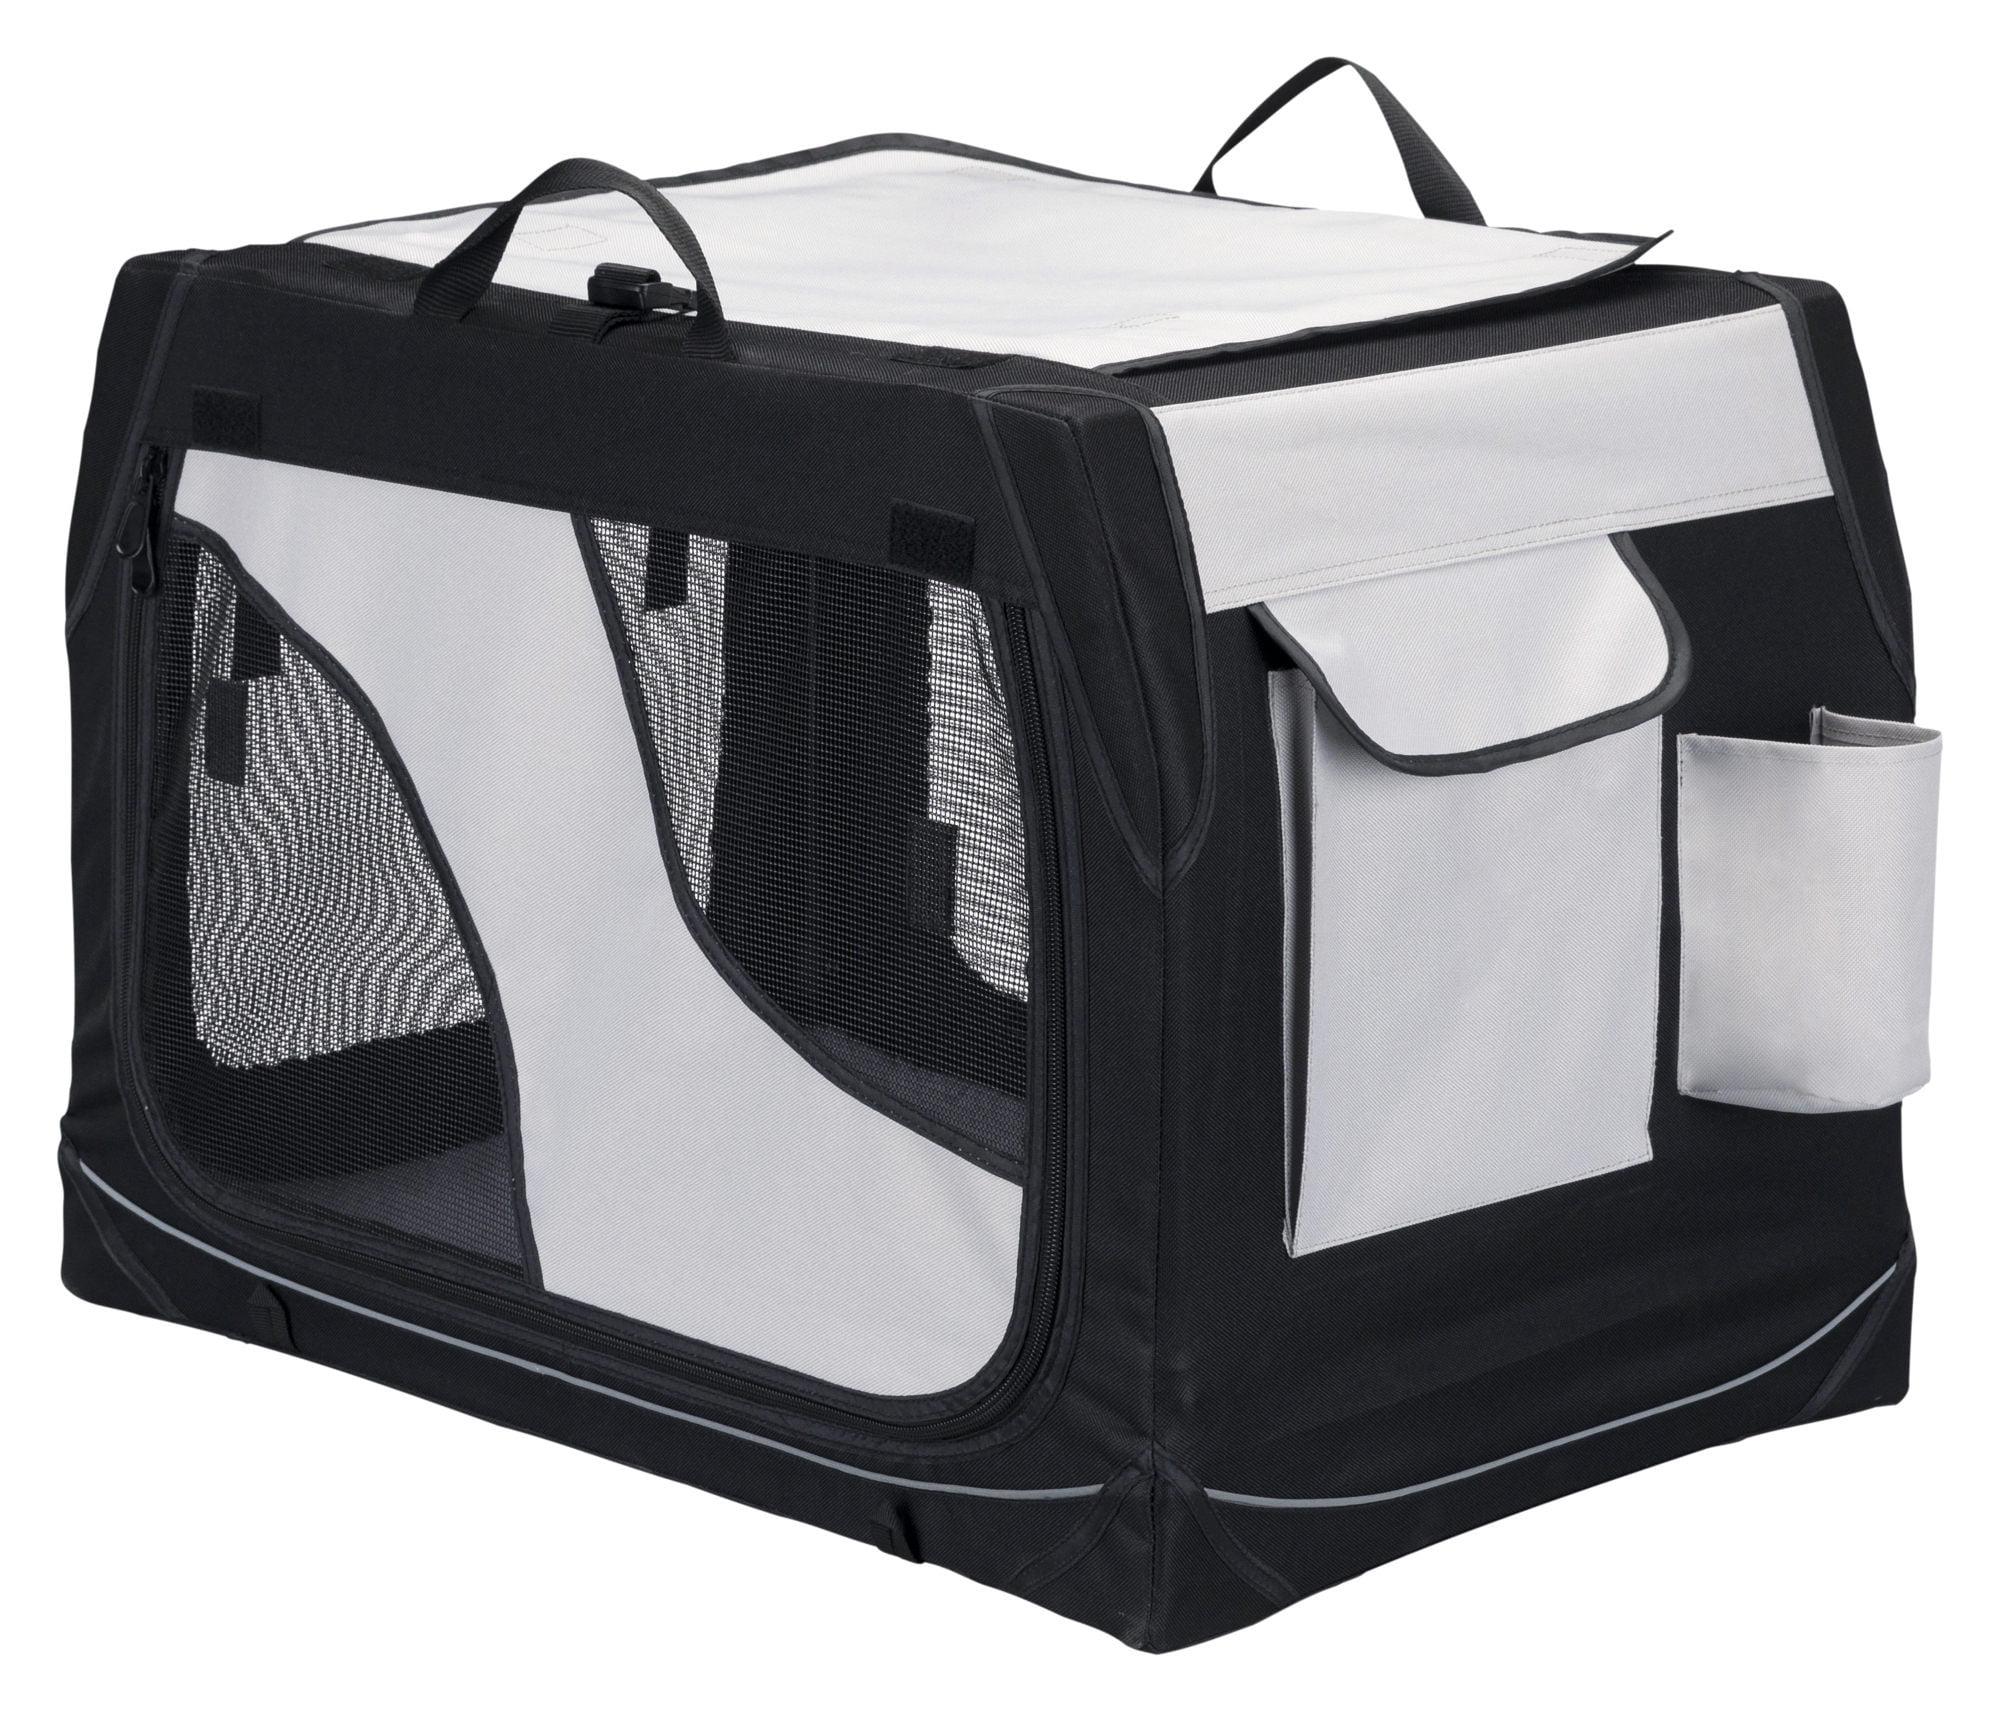 Trixie Vervoersbox  76 x 48 x  51 cm, zwart grijs